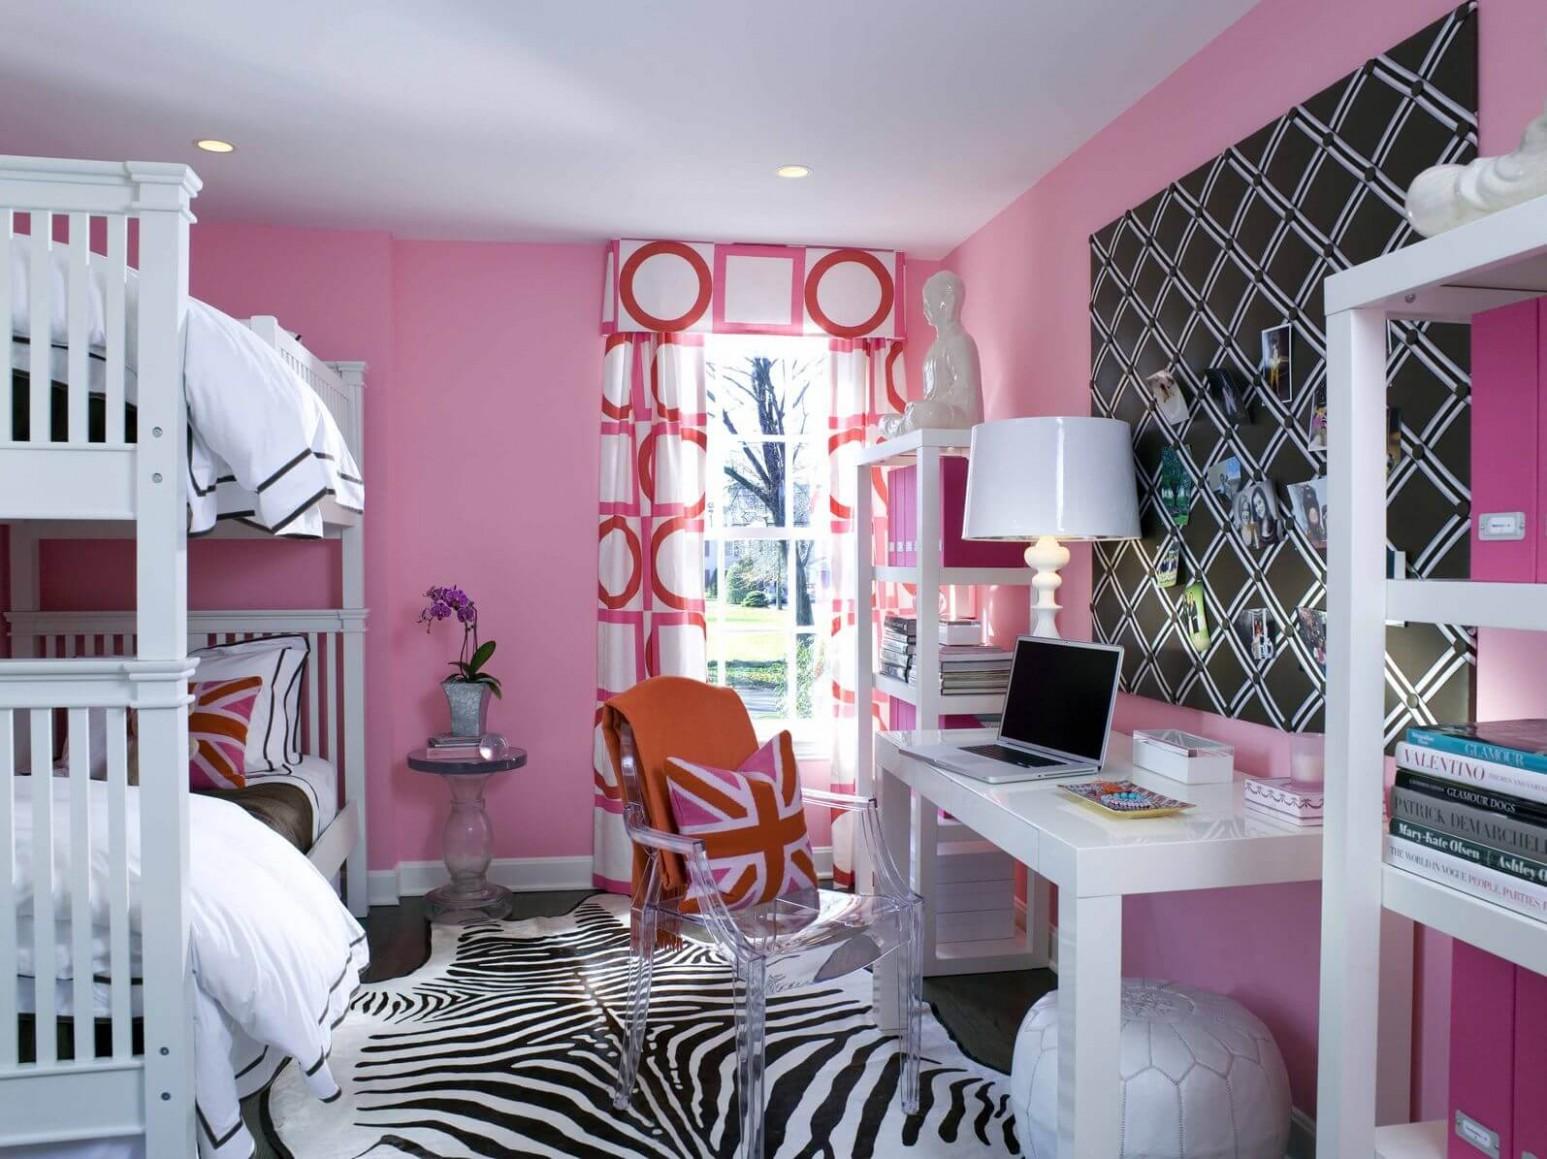 12 Zebra Bedroom Décor Themes, Ideas & Designs (Pictures) - Bedroom Decorating Ideas Zebra